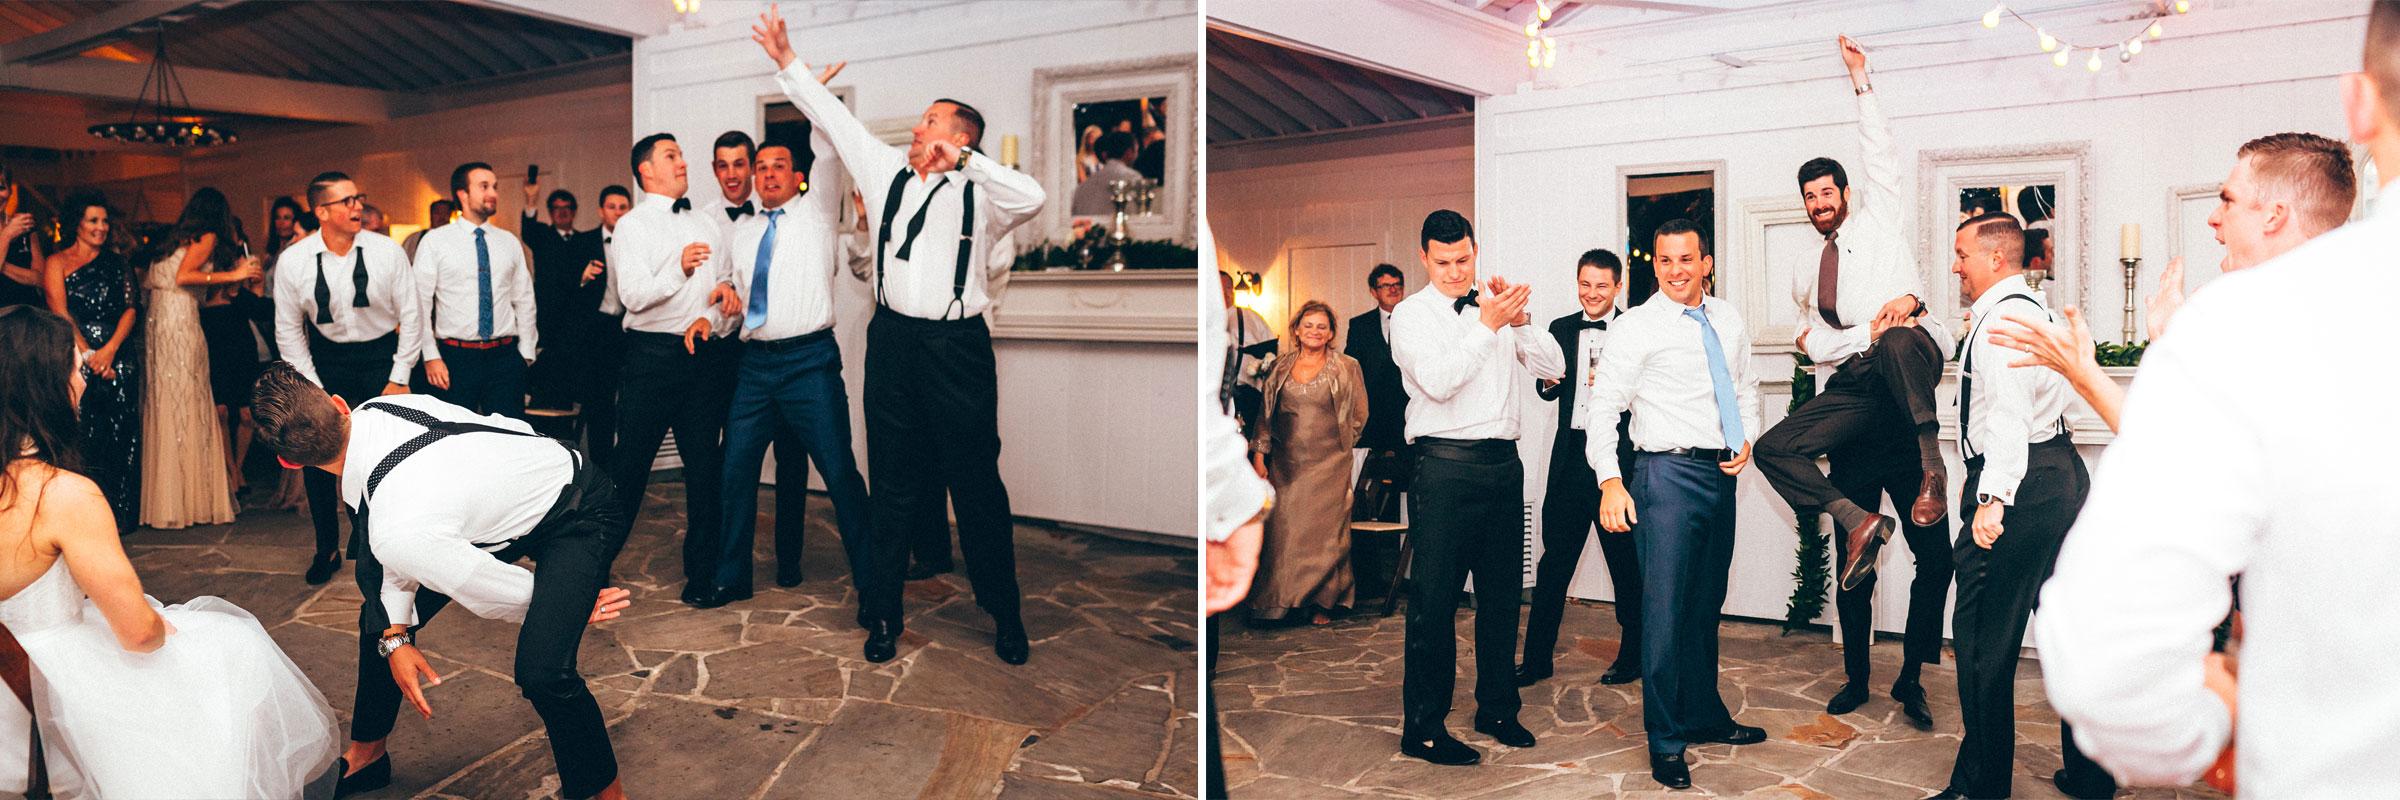 Me & Mr. Jones Wedding, Reception at Cedarwood in Nashville, Gold Wedding, Funny Wedding Photos, Garter Toss